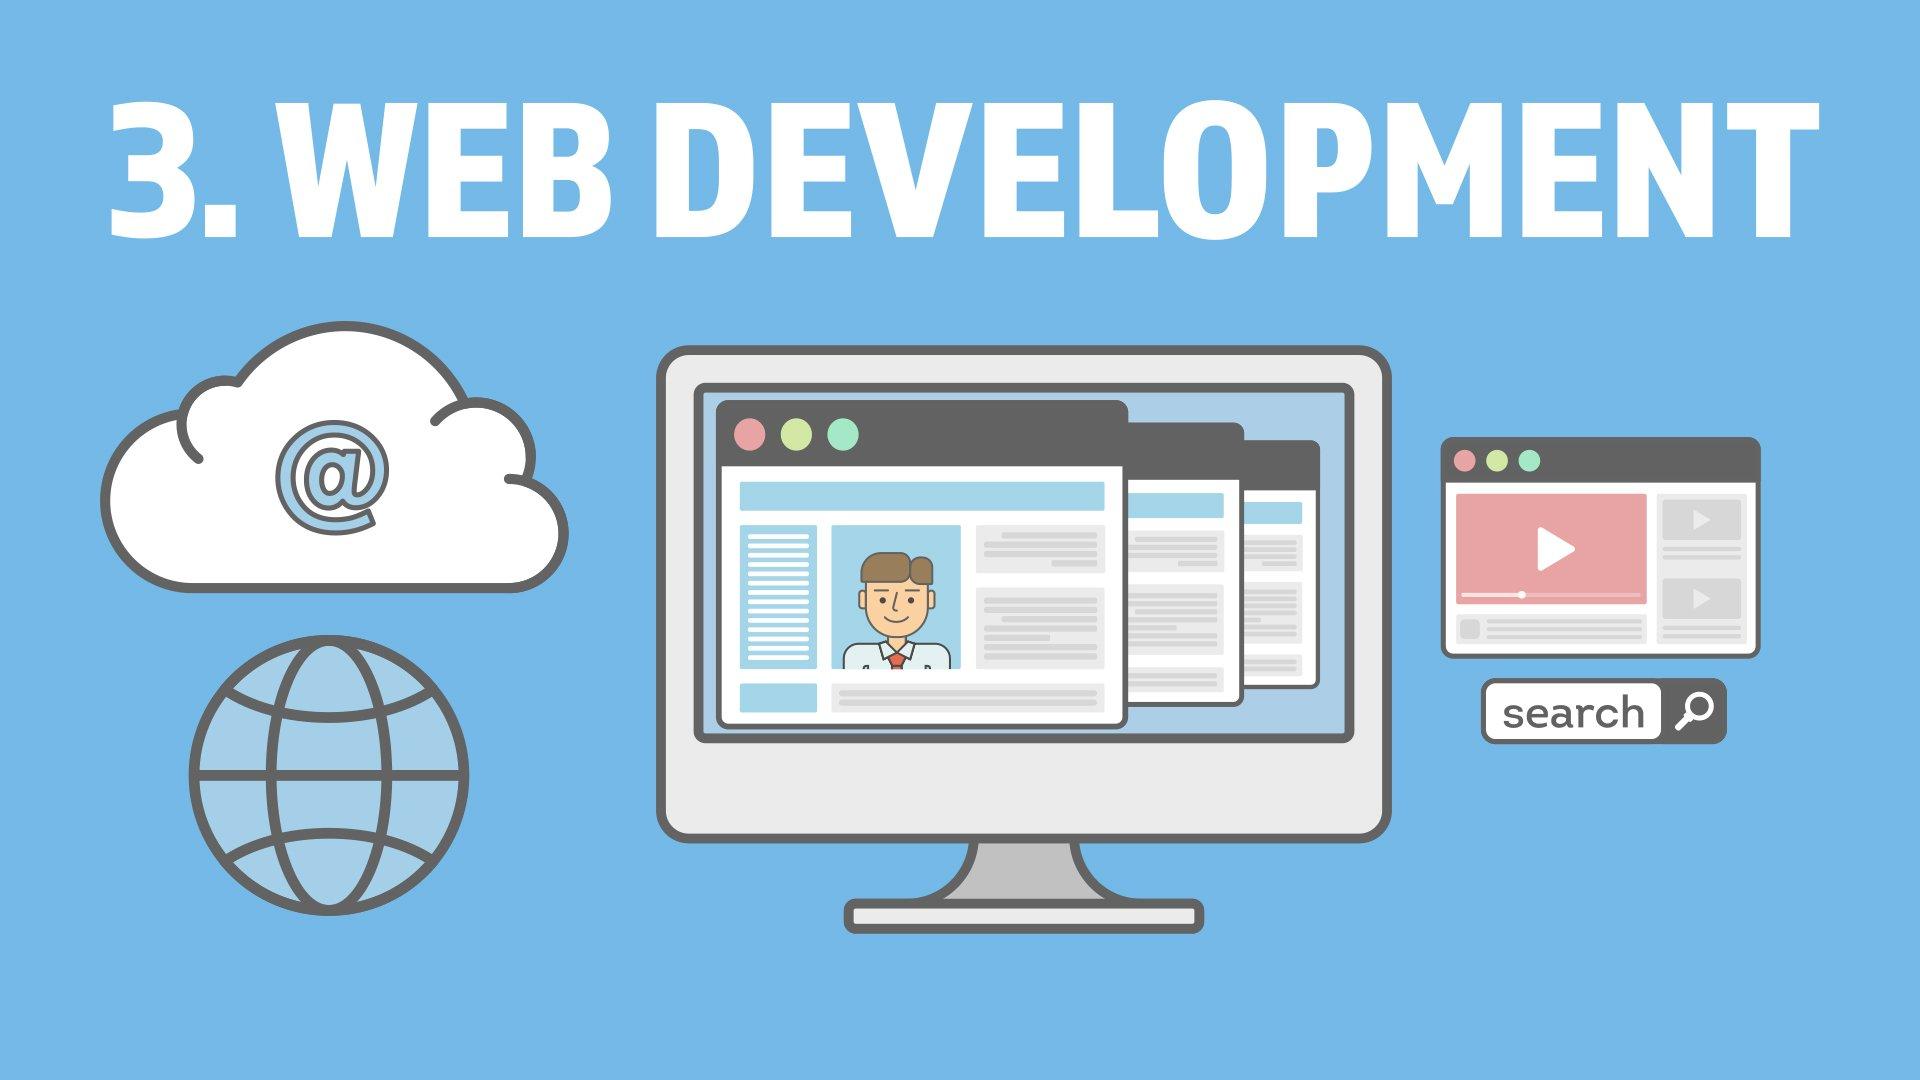 3. Website Development